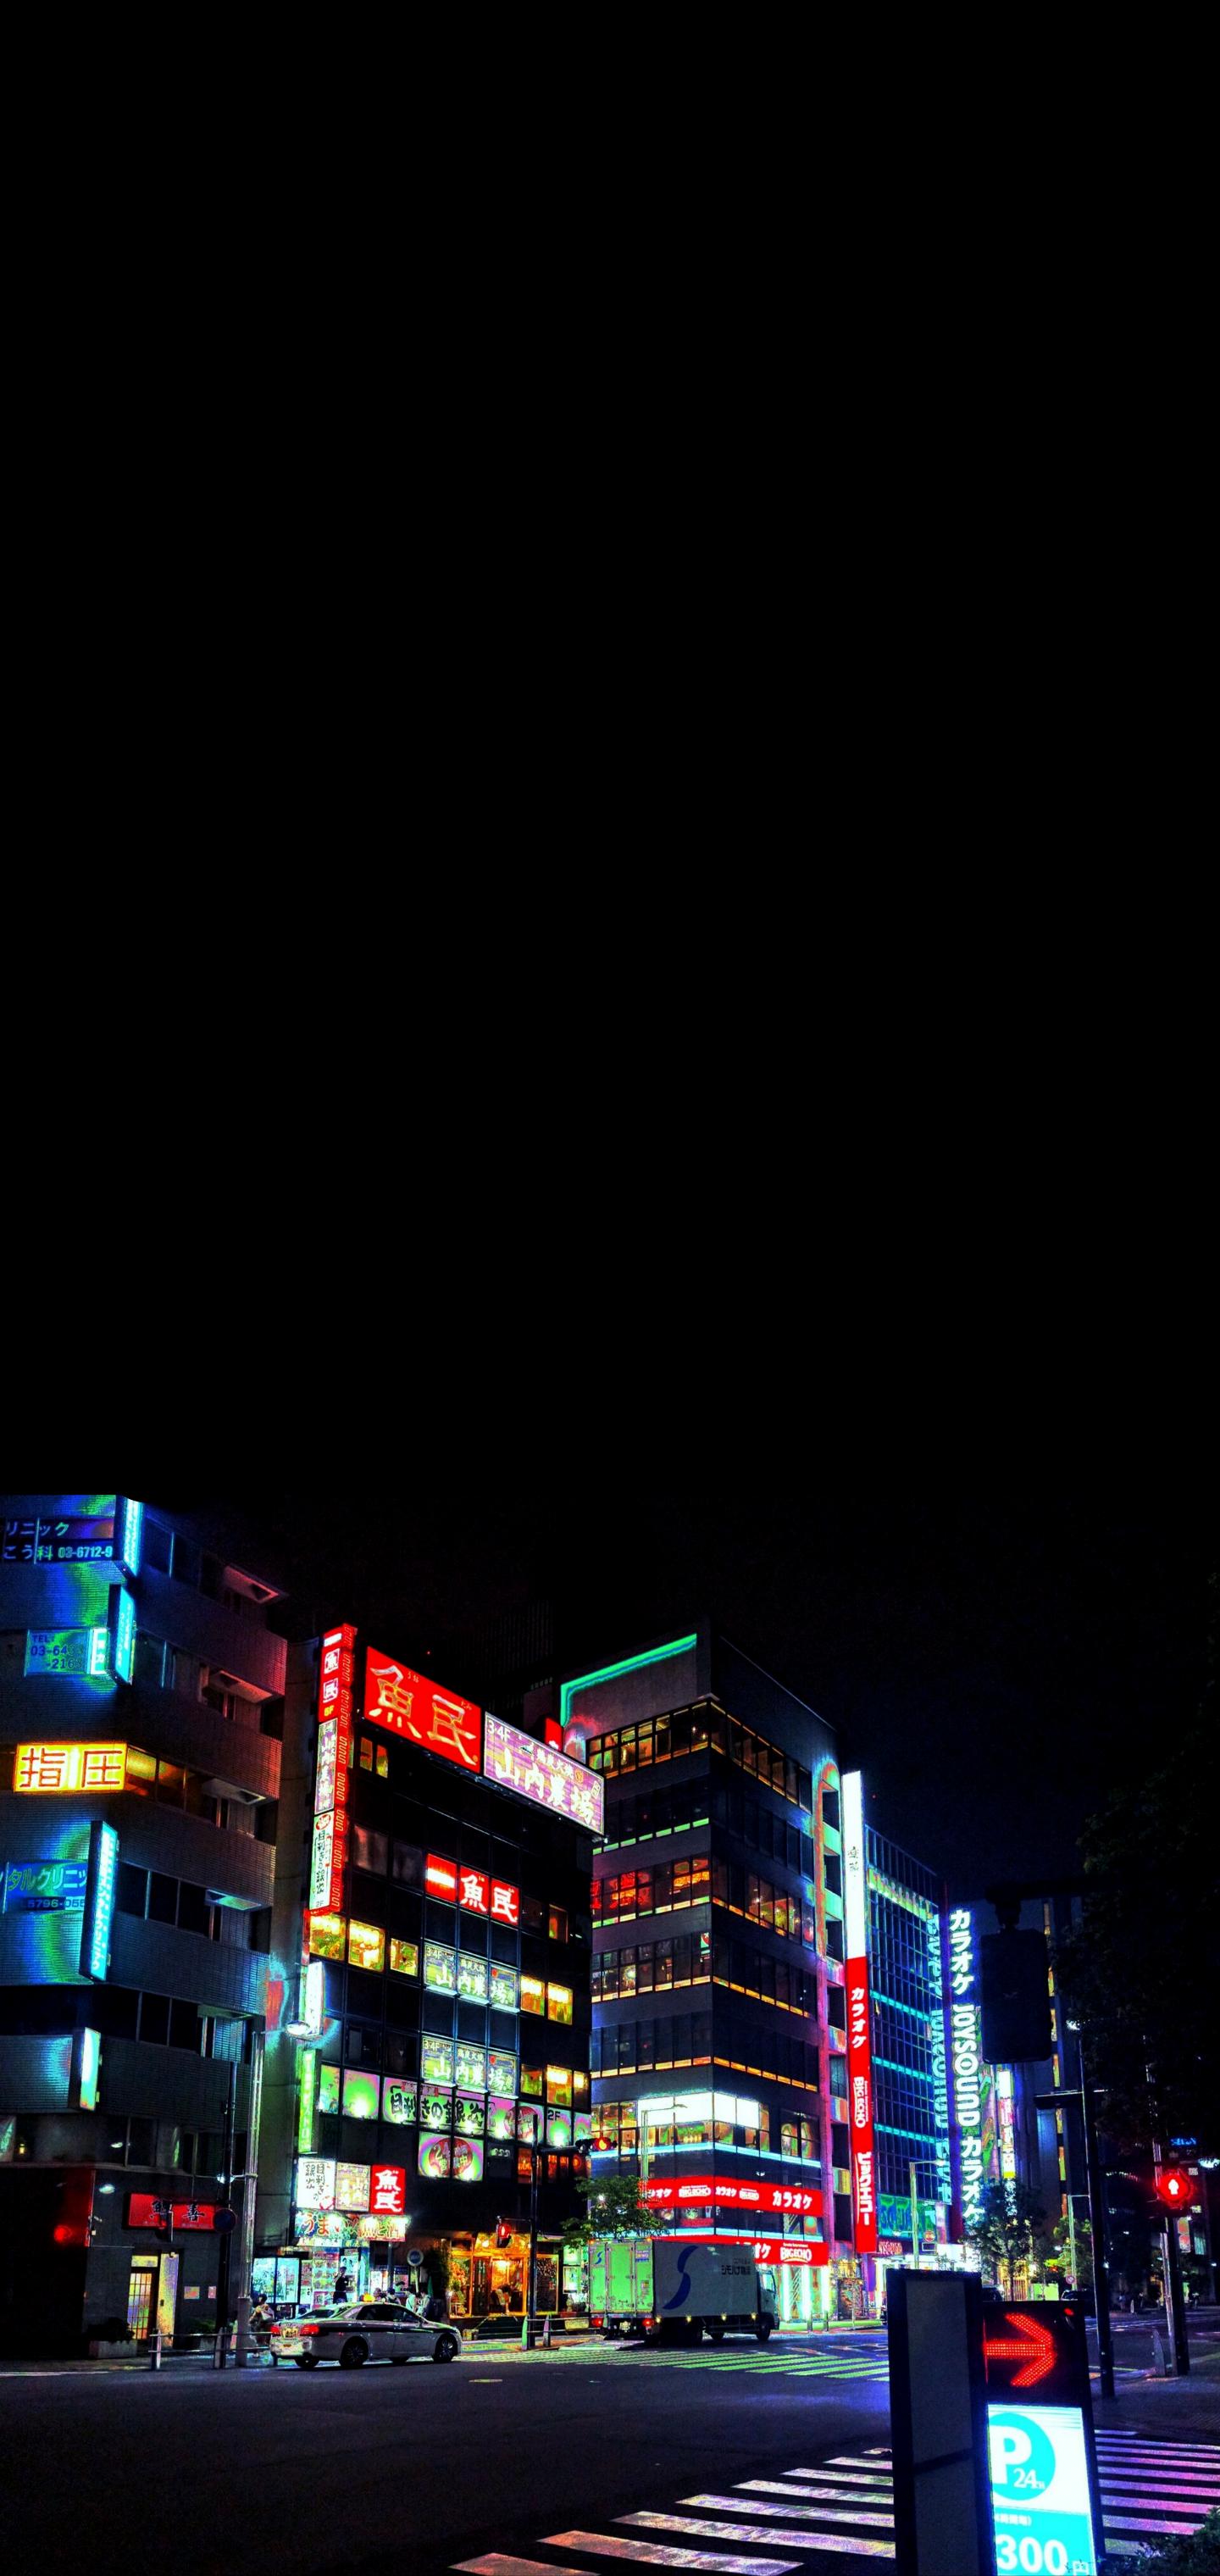 Https Media Idownloadblog Com Wp Content Uploads 2019 09 Oled Iphone 11 Pro Optimized Wallpaper Tokyo Png Wallpaper Ponsel Ilustrasi 3d Fotografi